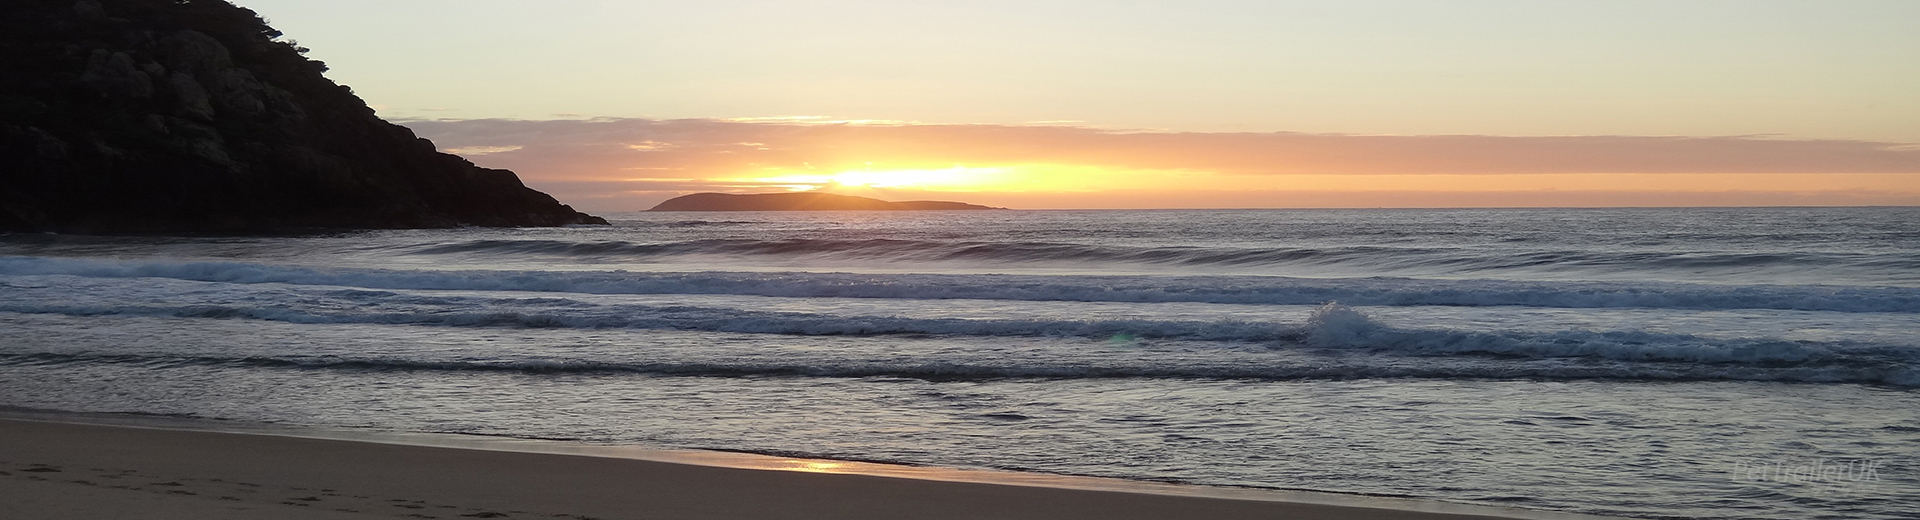 Pettrailer UK Beach Sunrise